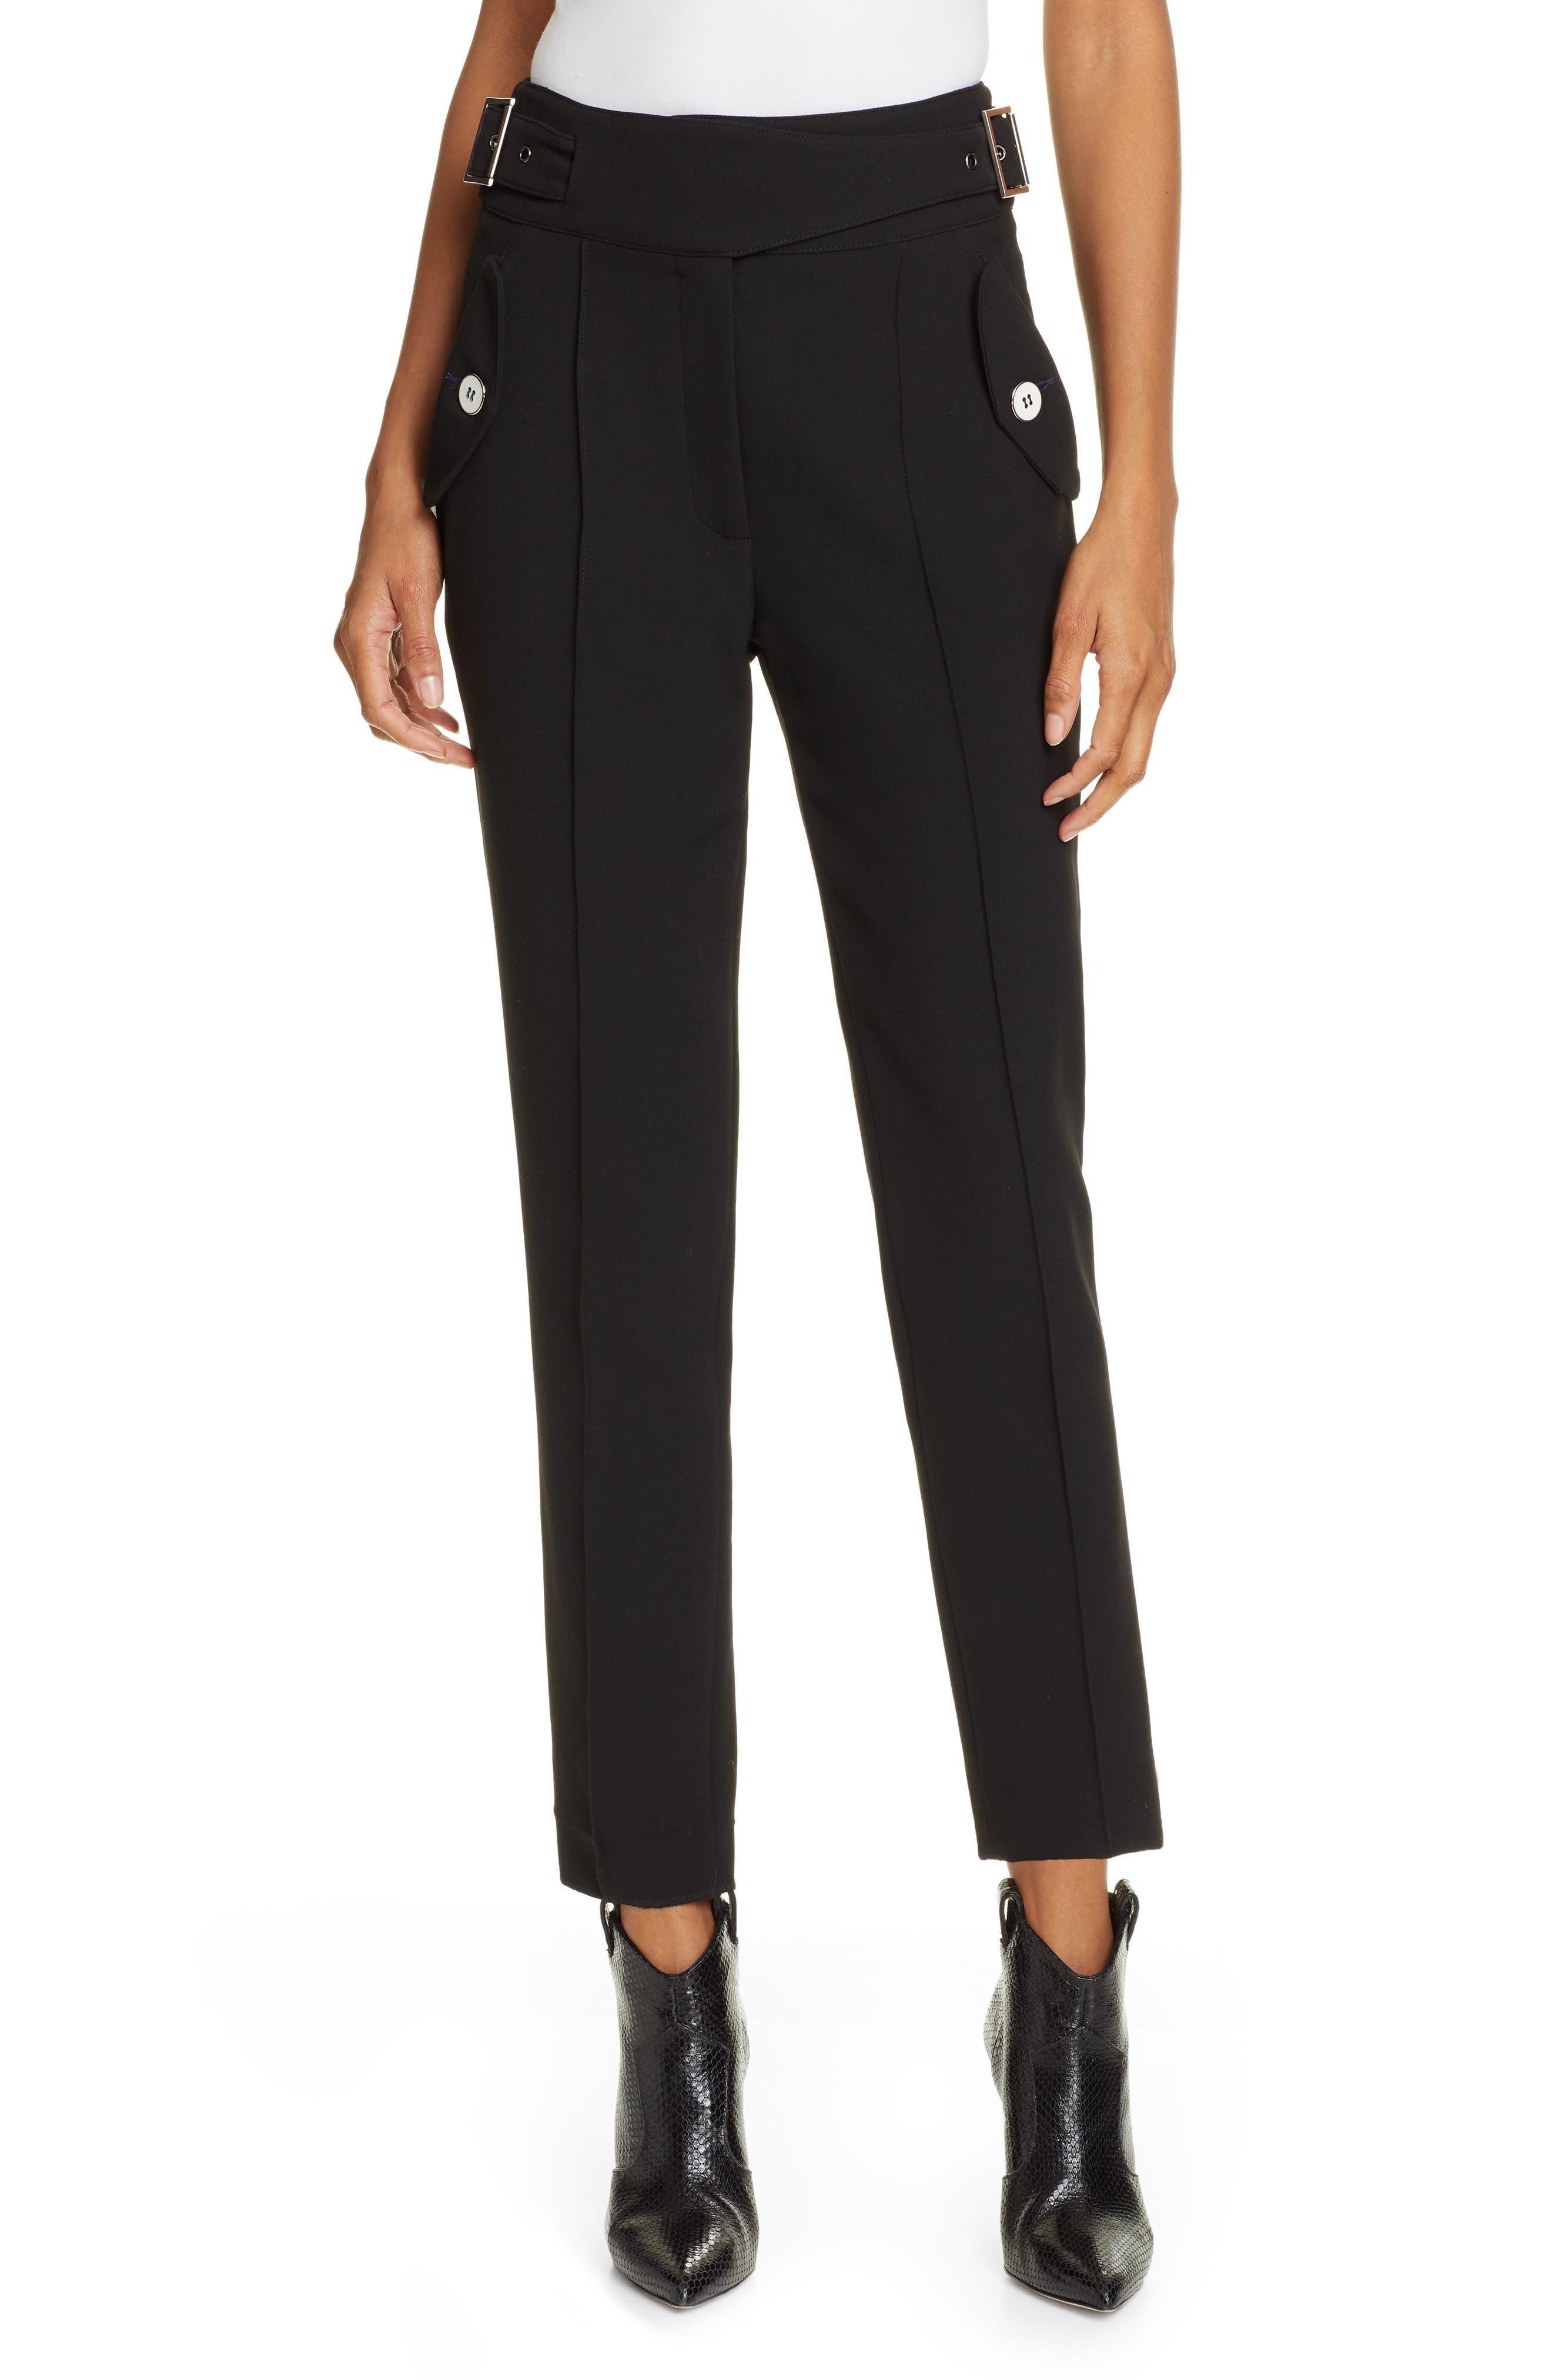 VERONICA BEARD Jaina Pants, Main, color, BLACK